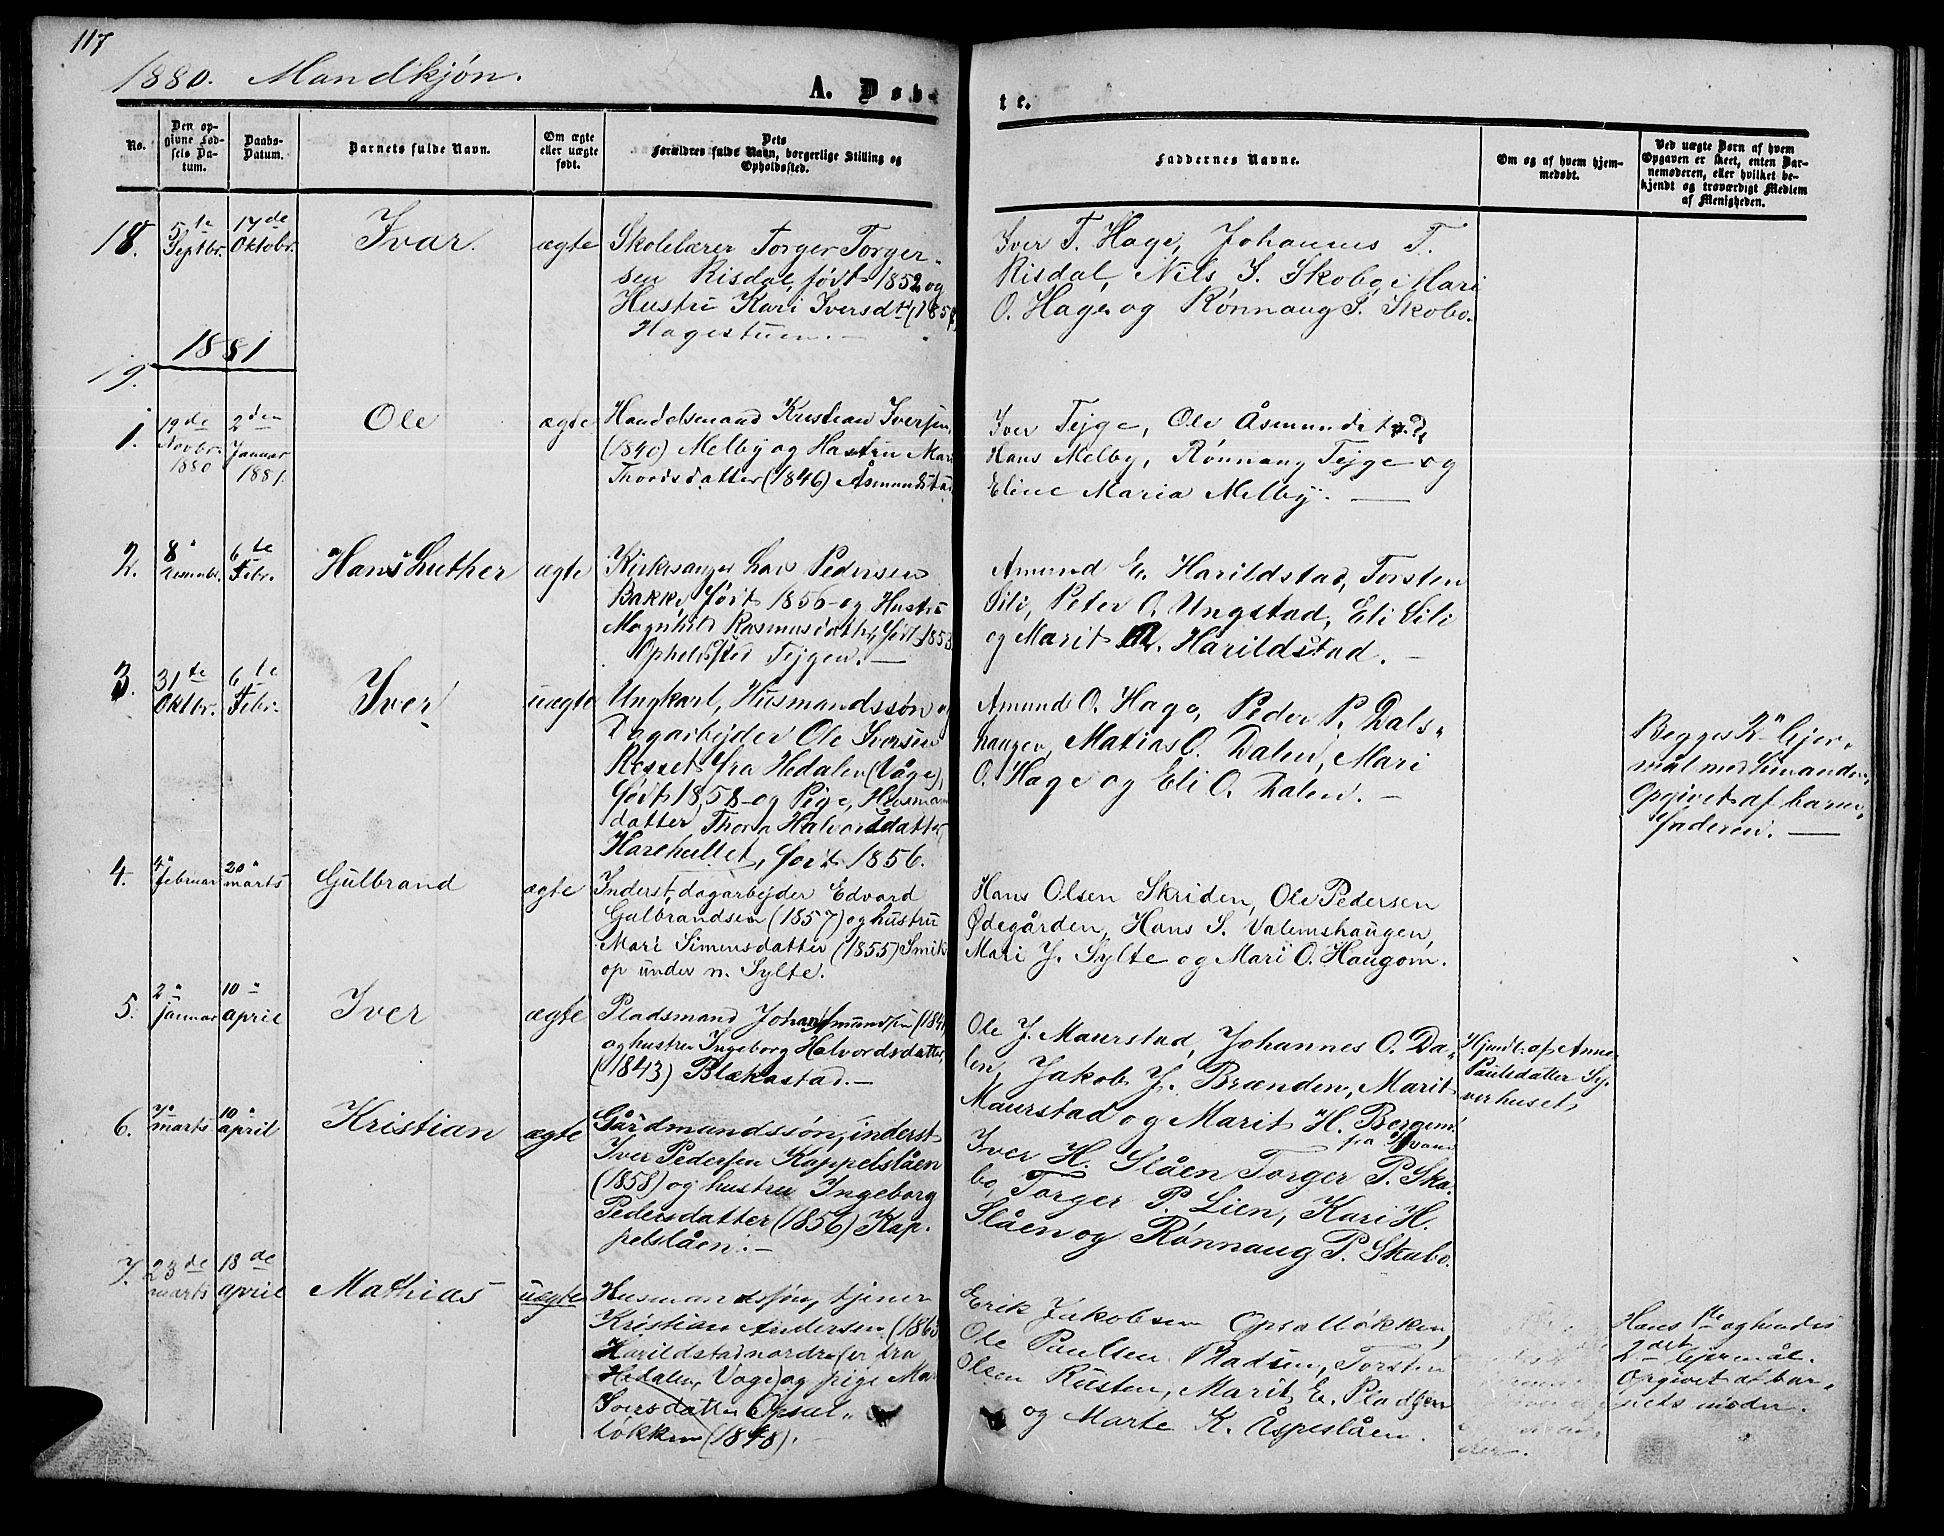 SAH, Nord-Fron prestekontor, Klokkerbok nr. 2, 1851-1883, s. 117